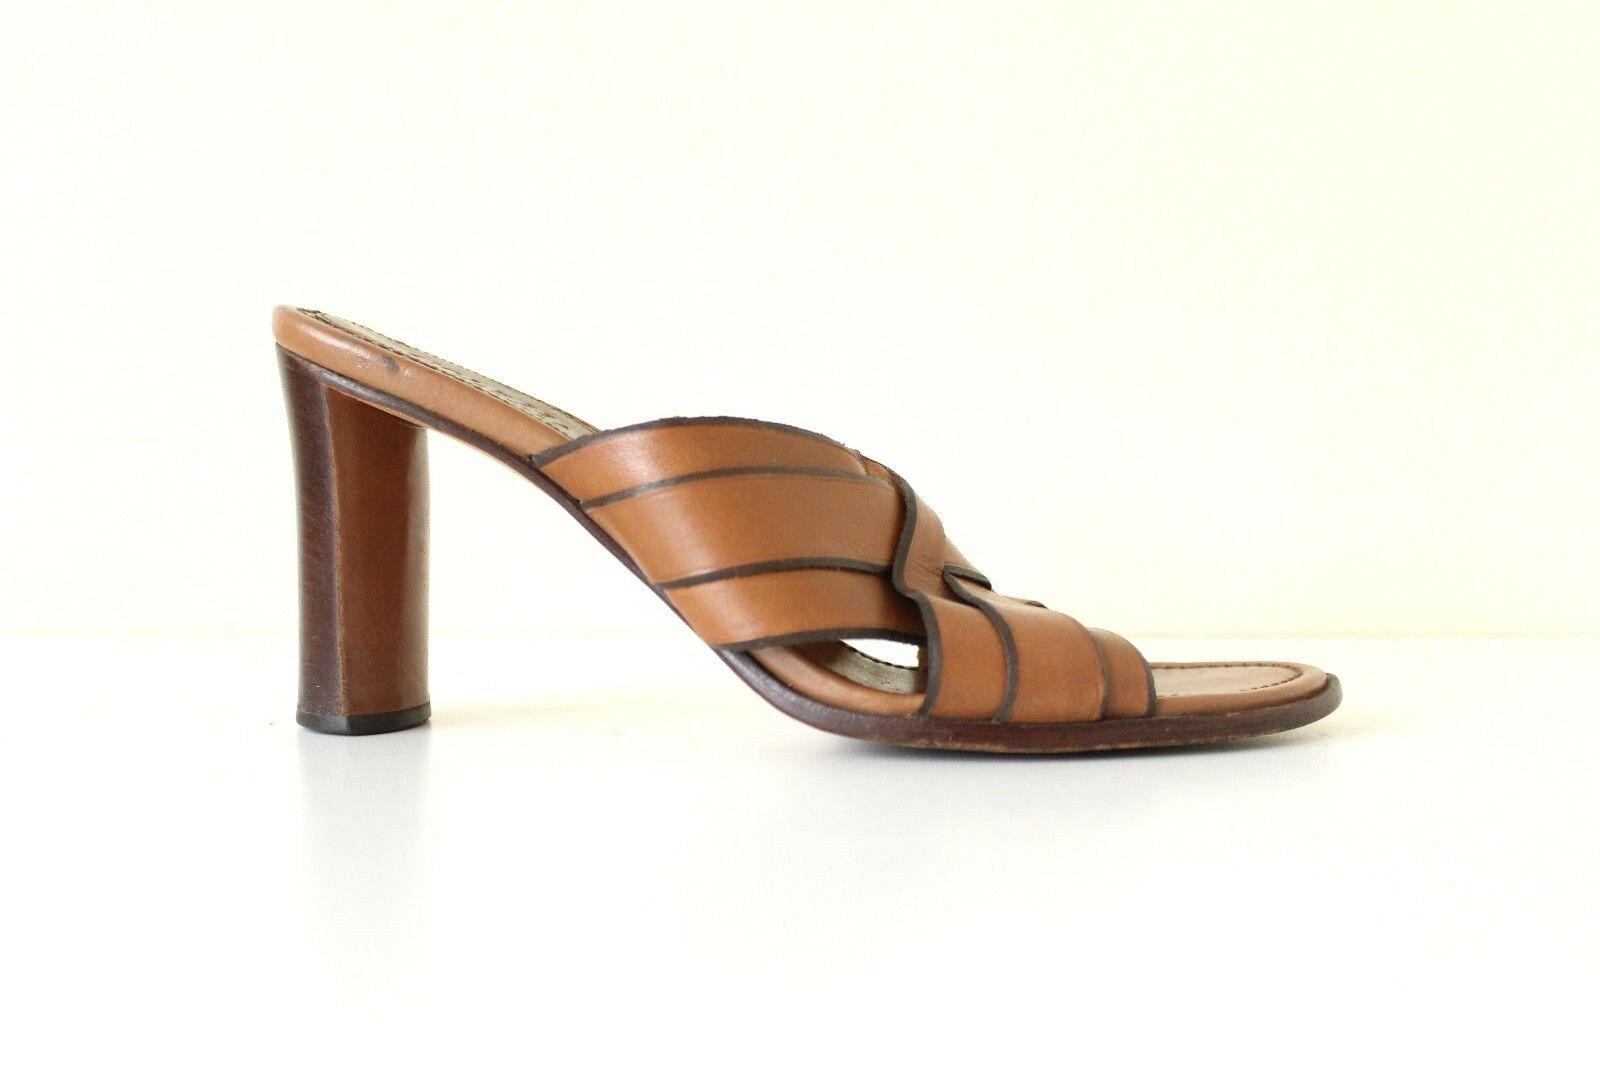 Women's Vintage COLE HAAN High Heel Slip On Brown 100% Leather Sandals Mules UK4